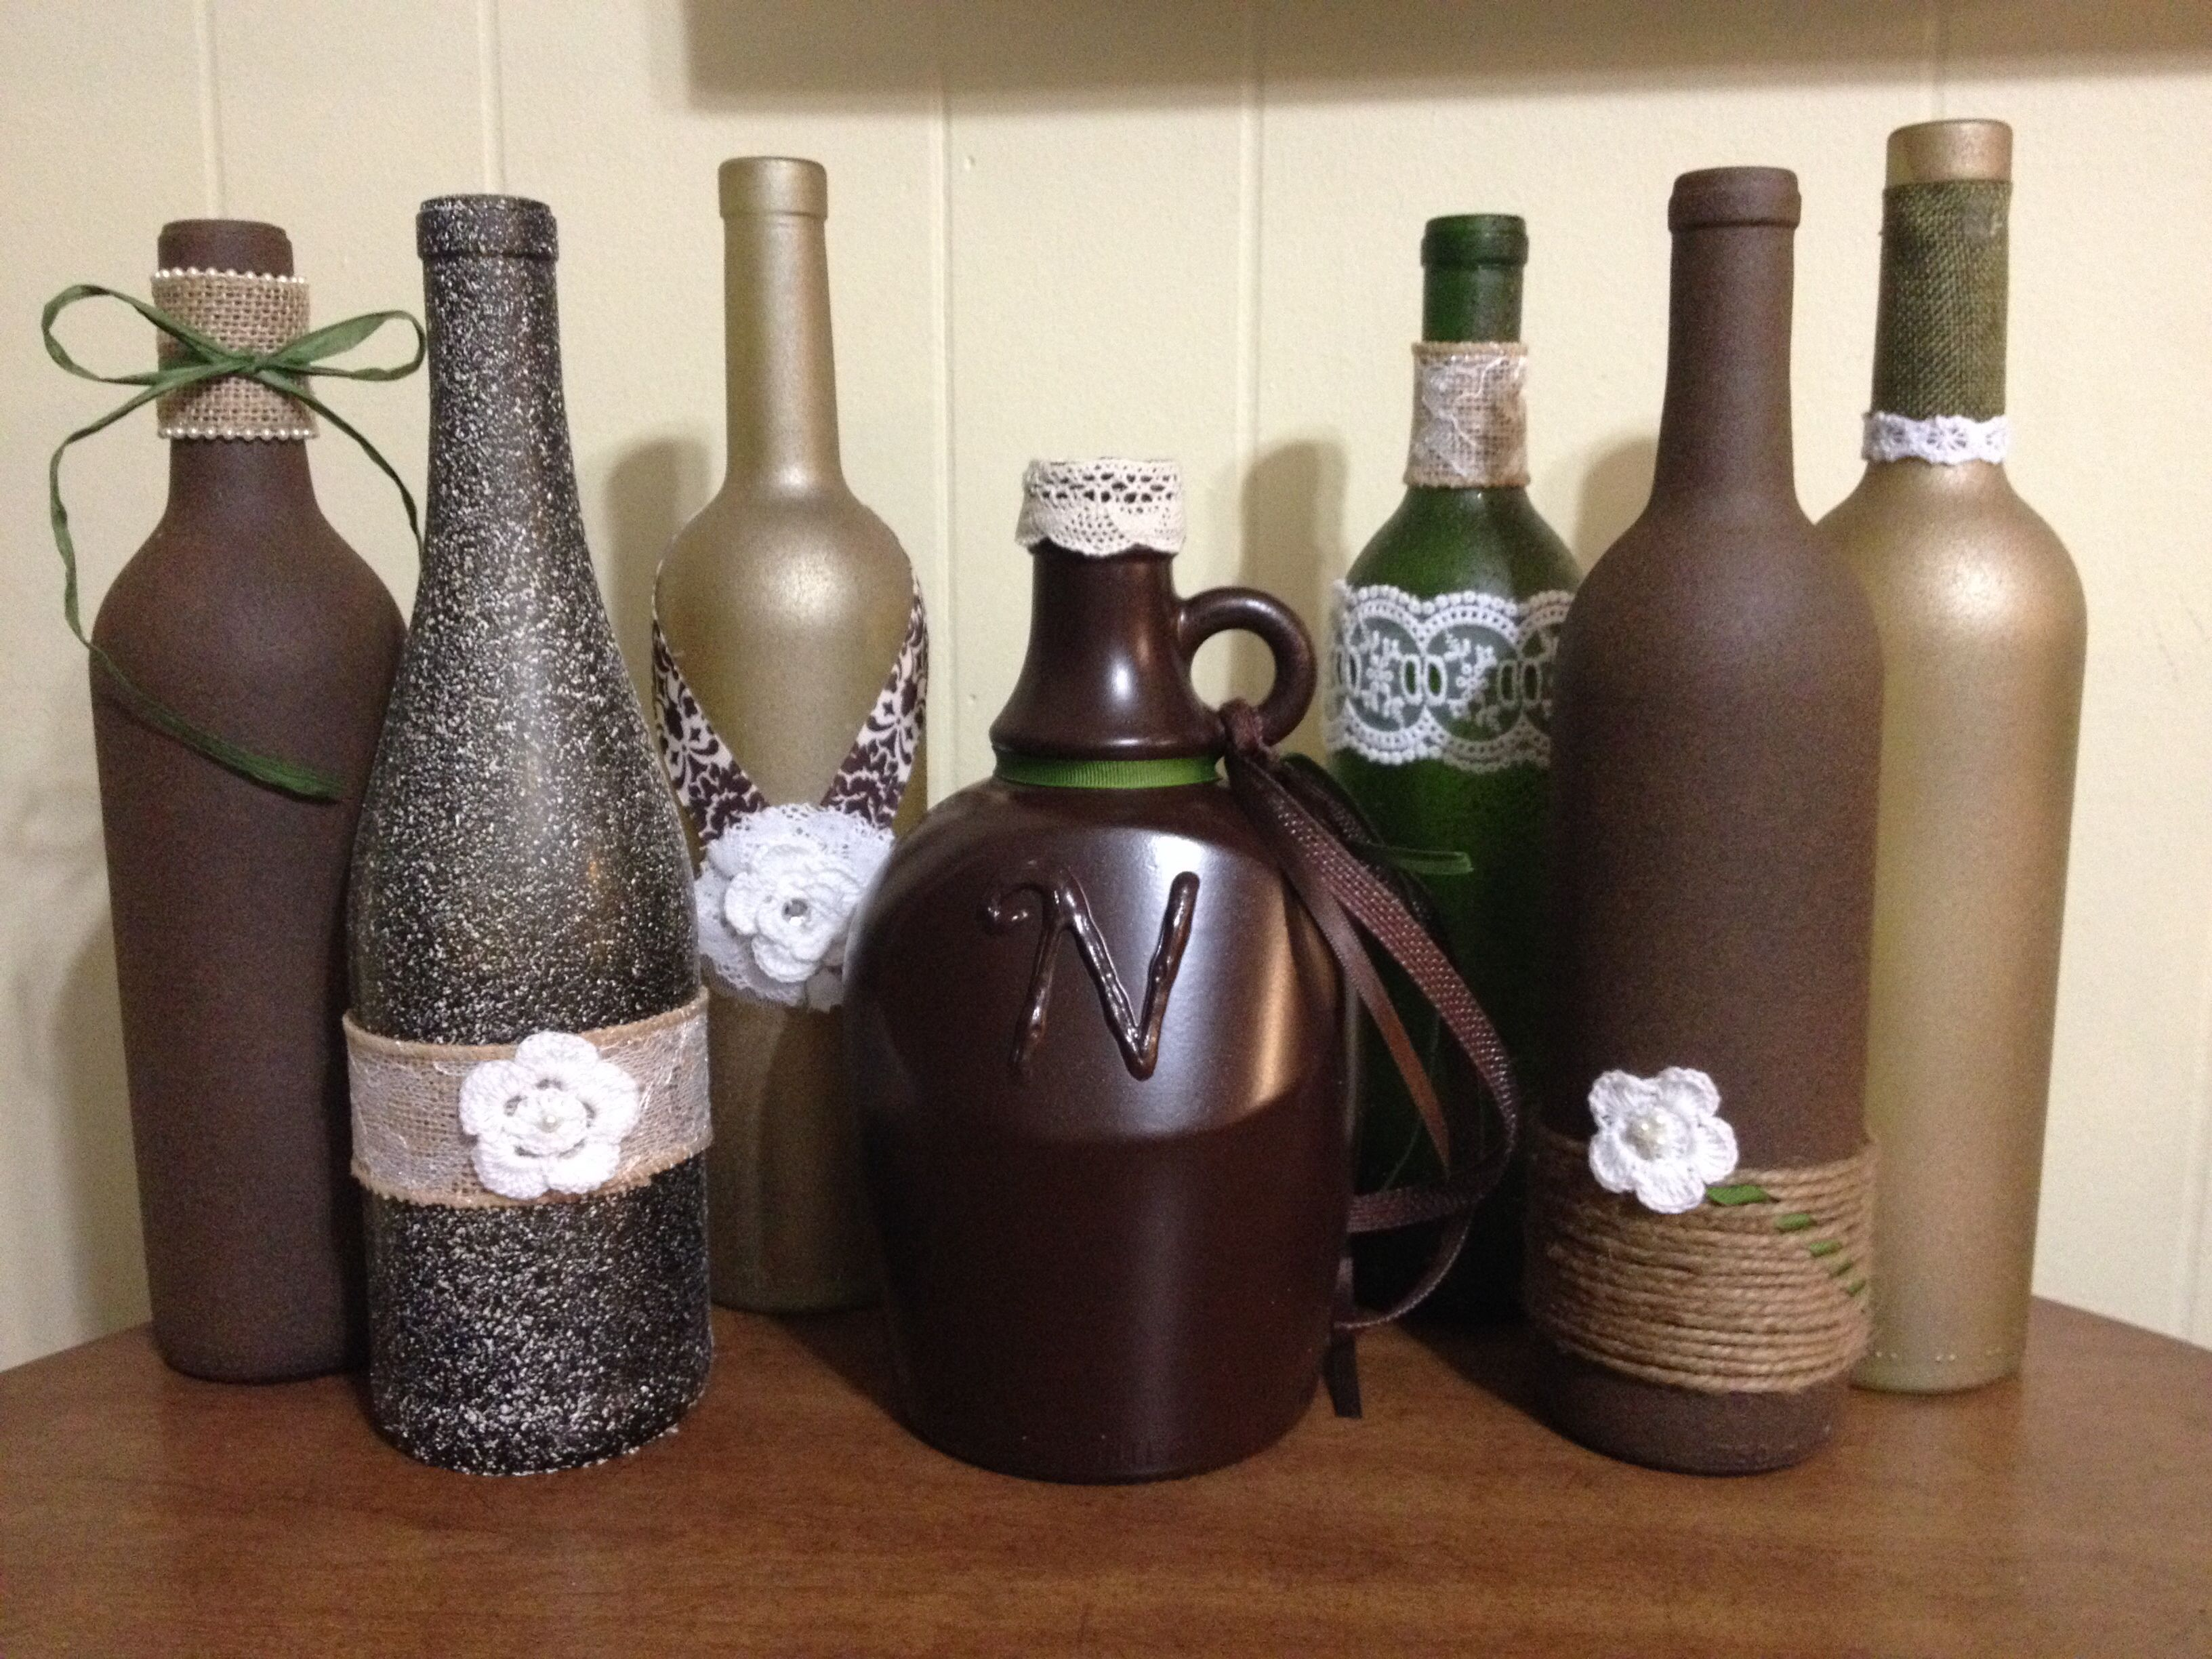 DIY repurposed wine bottles Centerpieces for rustic wedding or